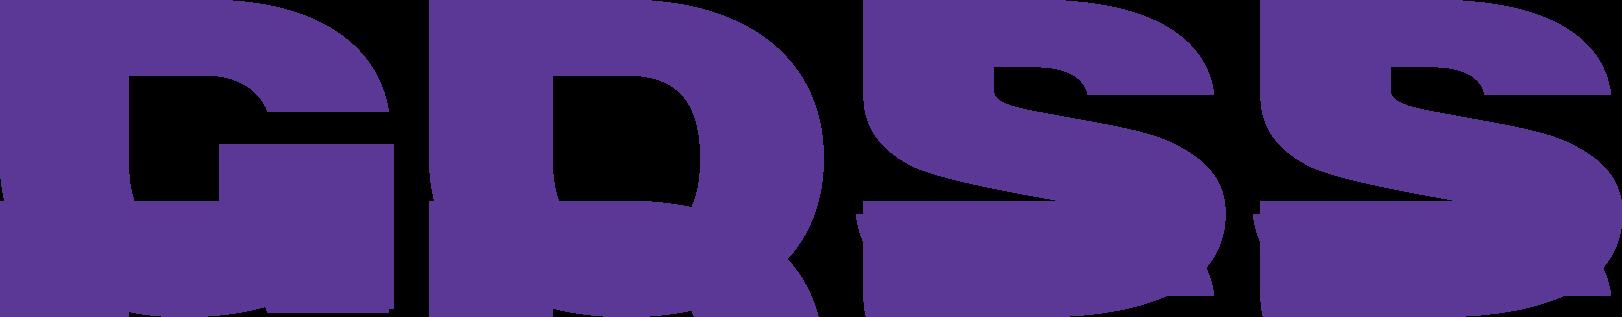 Bramble Hub and GOSS Interactive | Bramble Hub